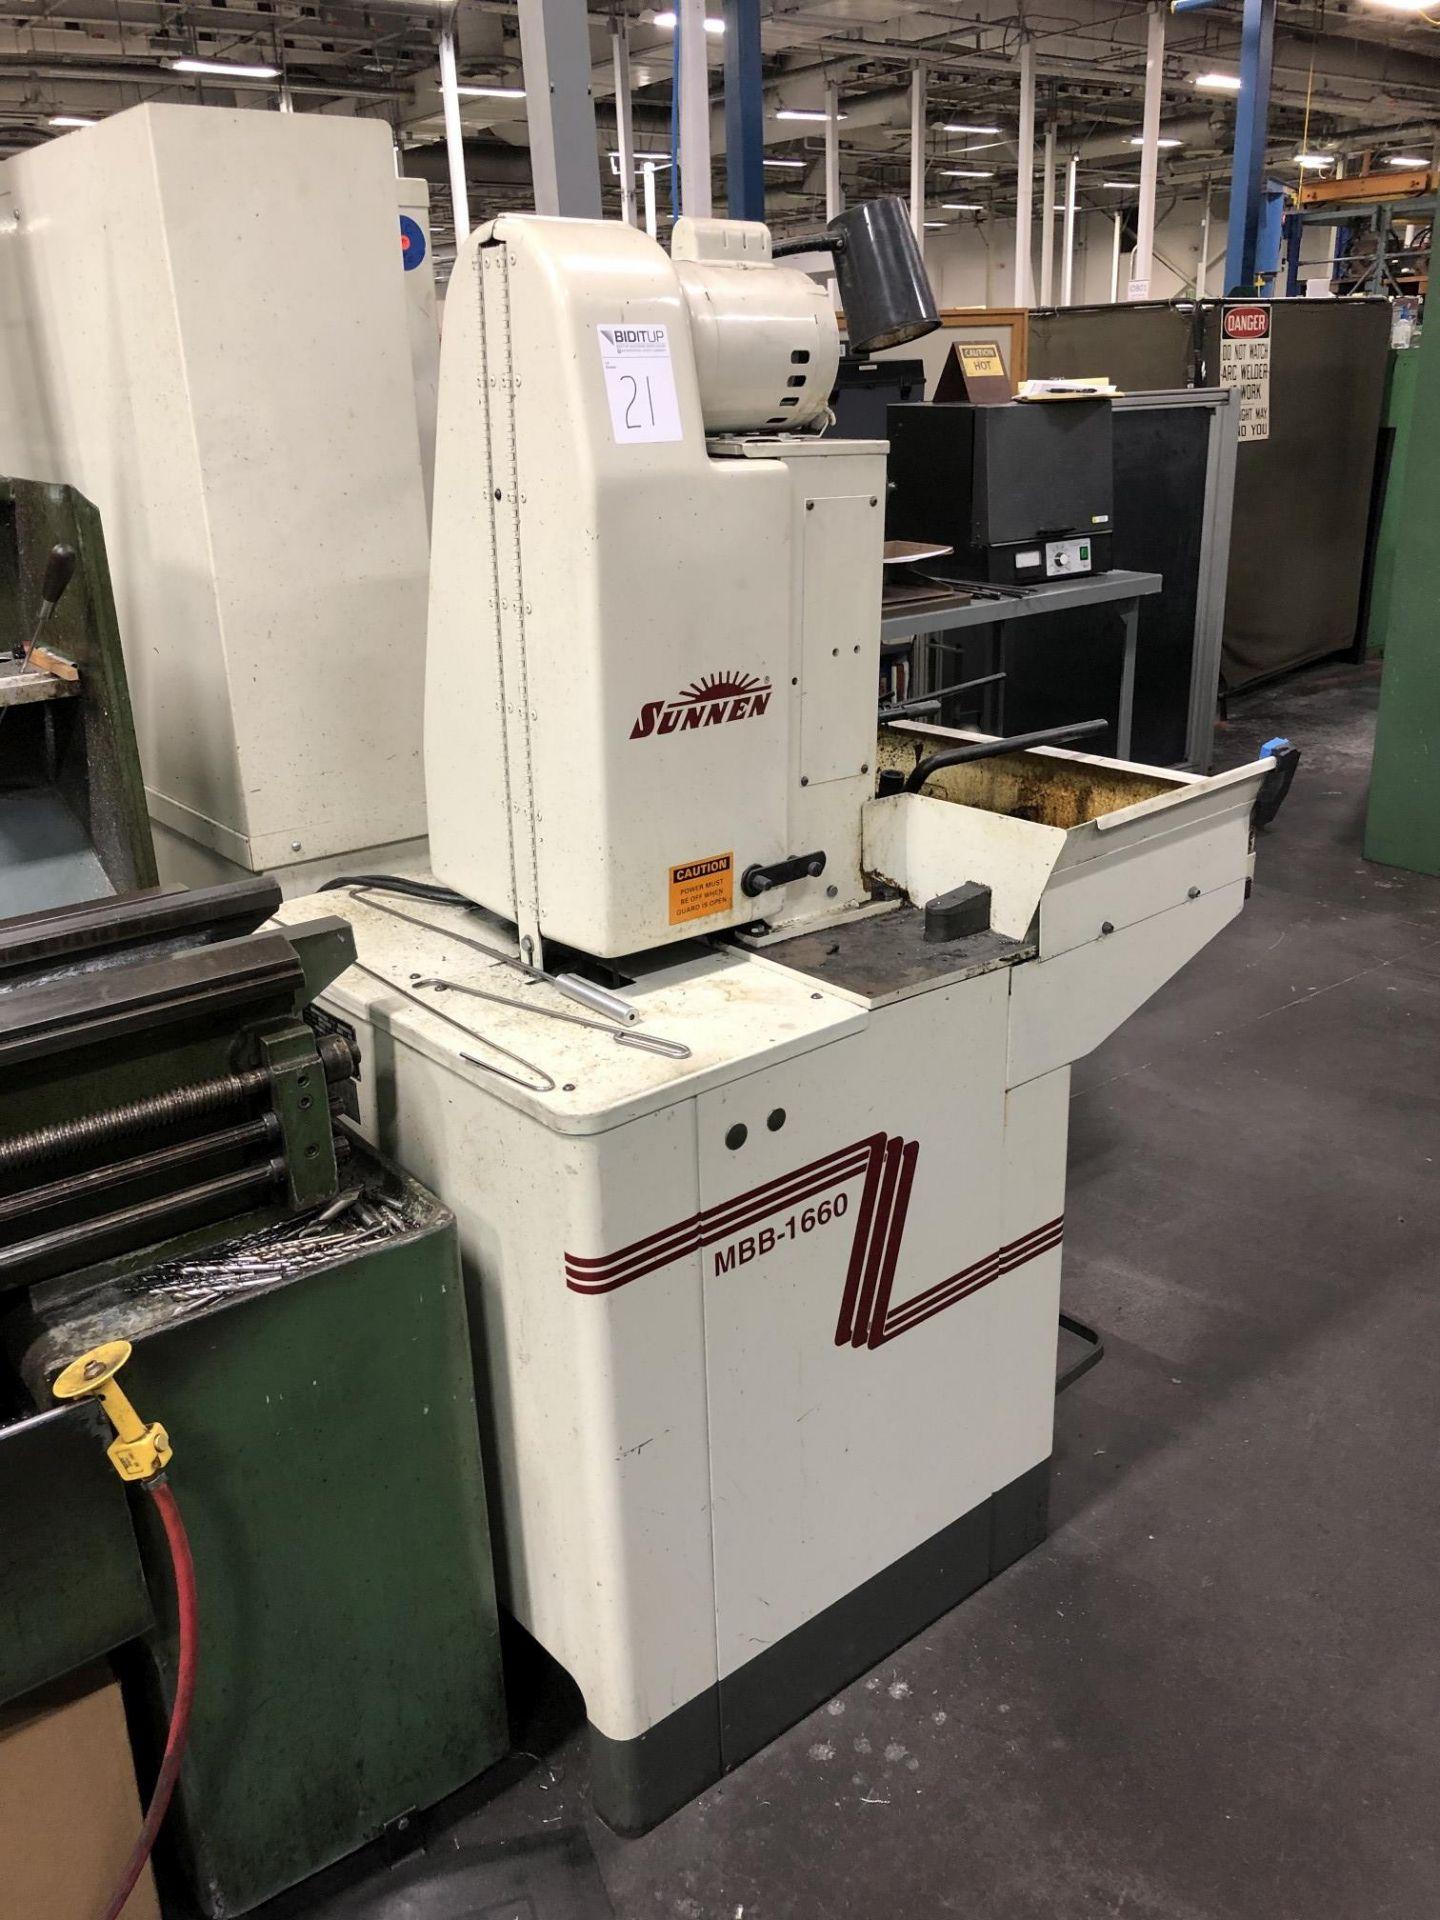 Sunnen MBB-1660 Precision Honing Machine - Image 5 of 8